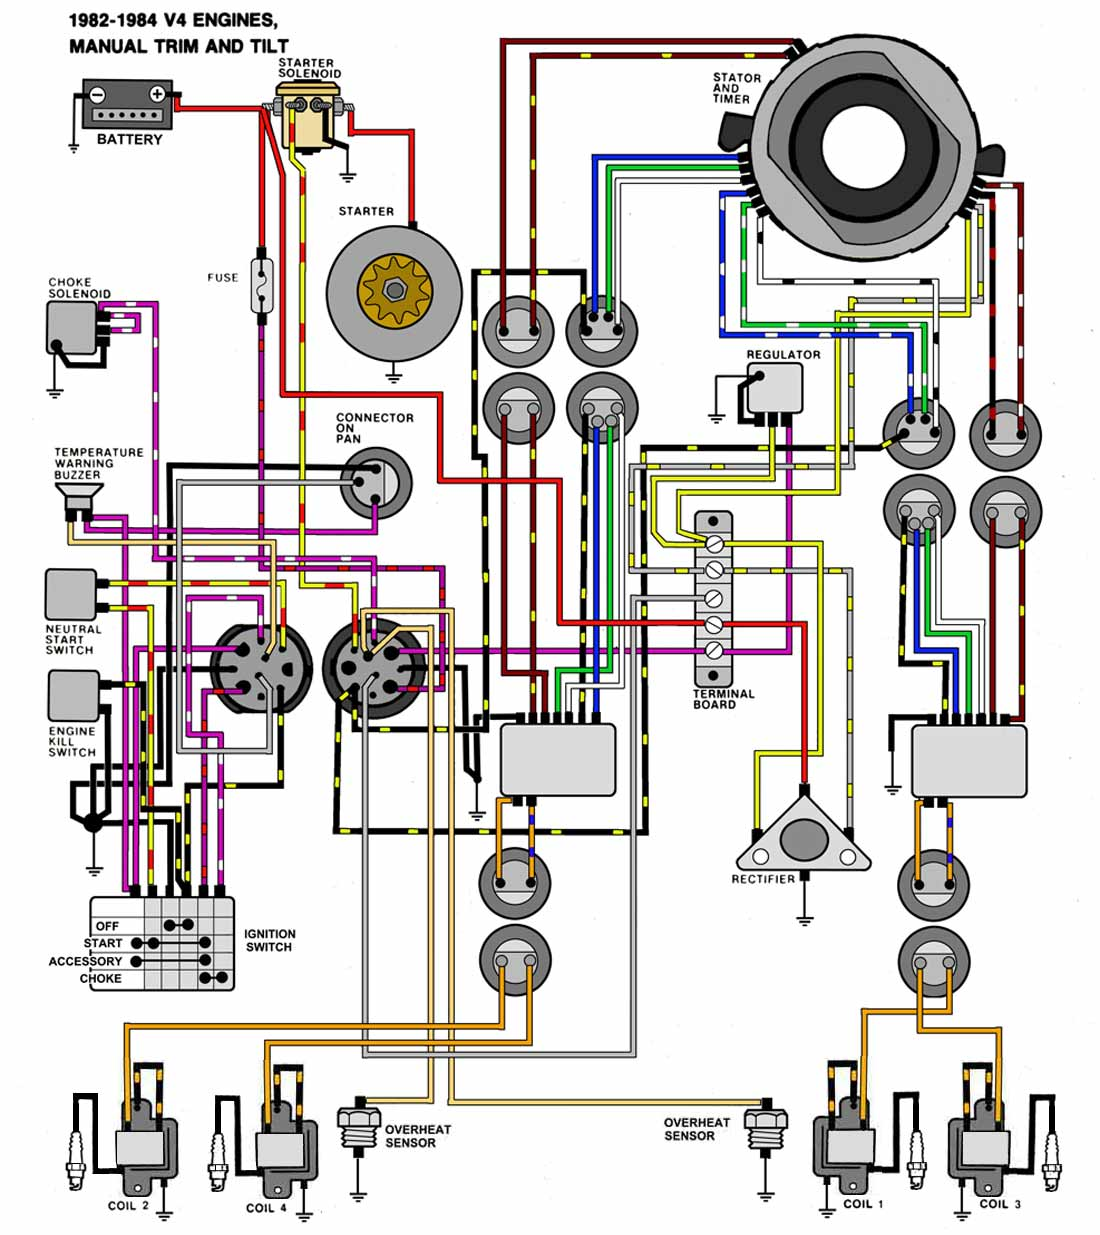 Brilliant Evinrude Johnson Outboard Wiring Diagrams Mastertech Marine Wiring Cloud Ittabpendurdonanfuldomelitekicepsianuembamohammedshrineorg